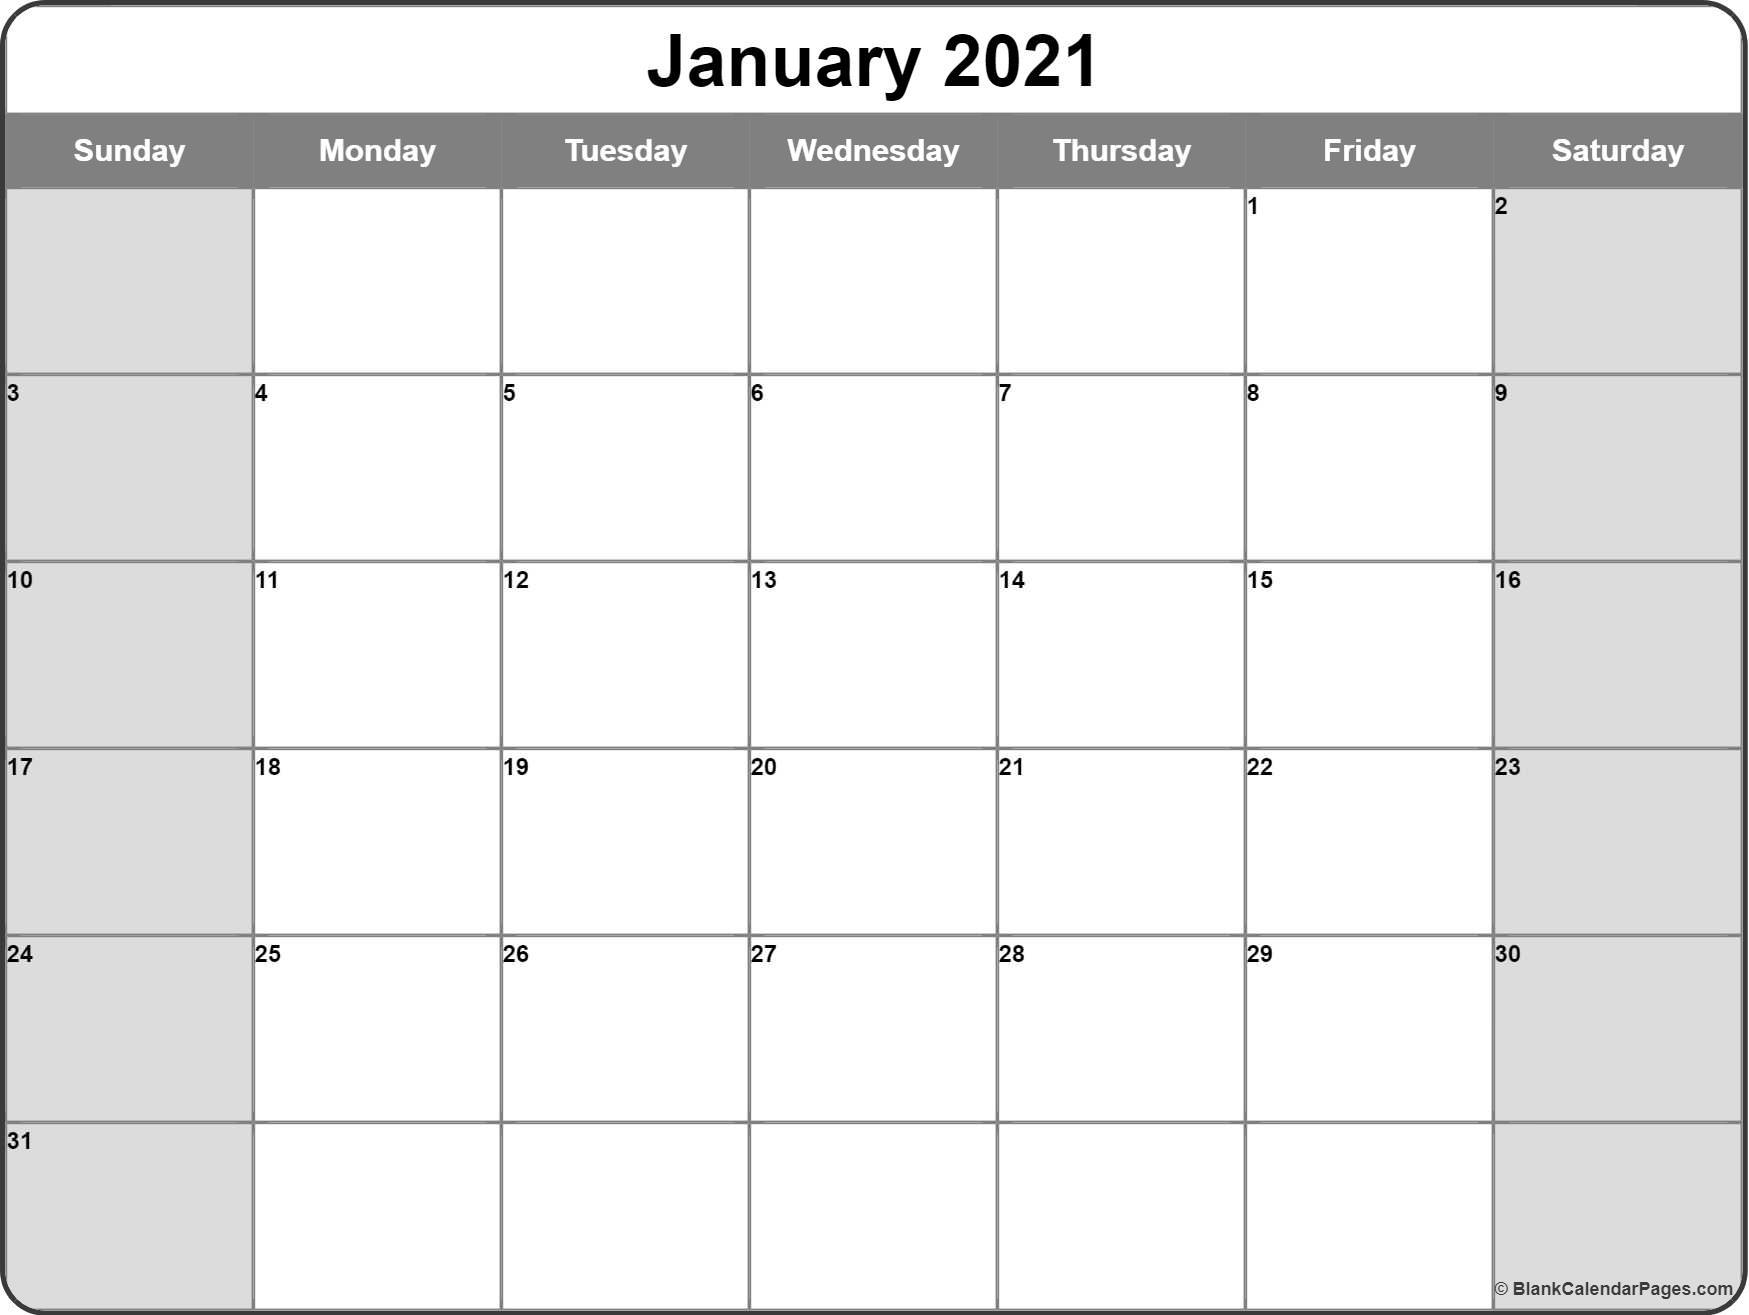 January 2021 Calendar | Free Printable Calendar Templates